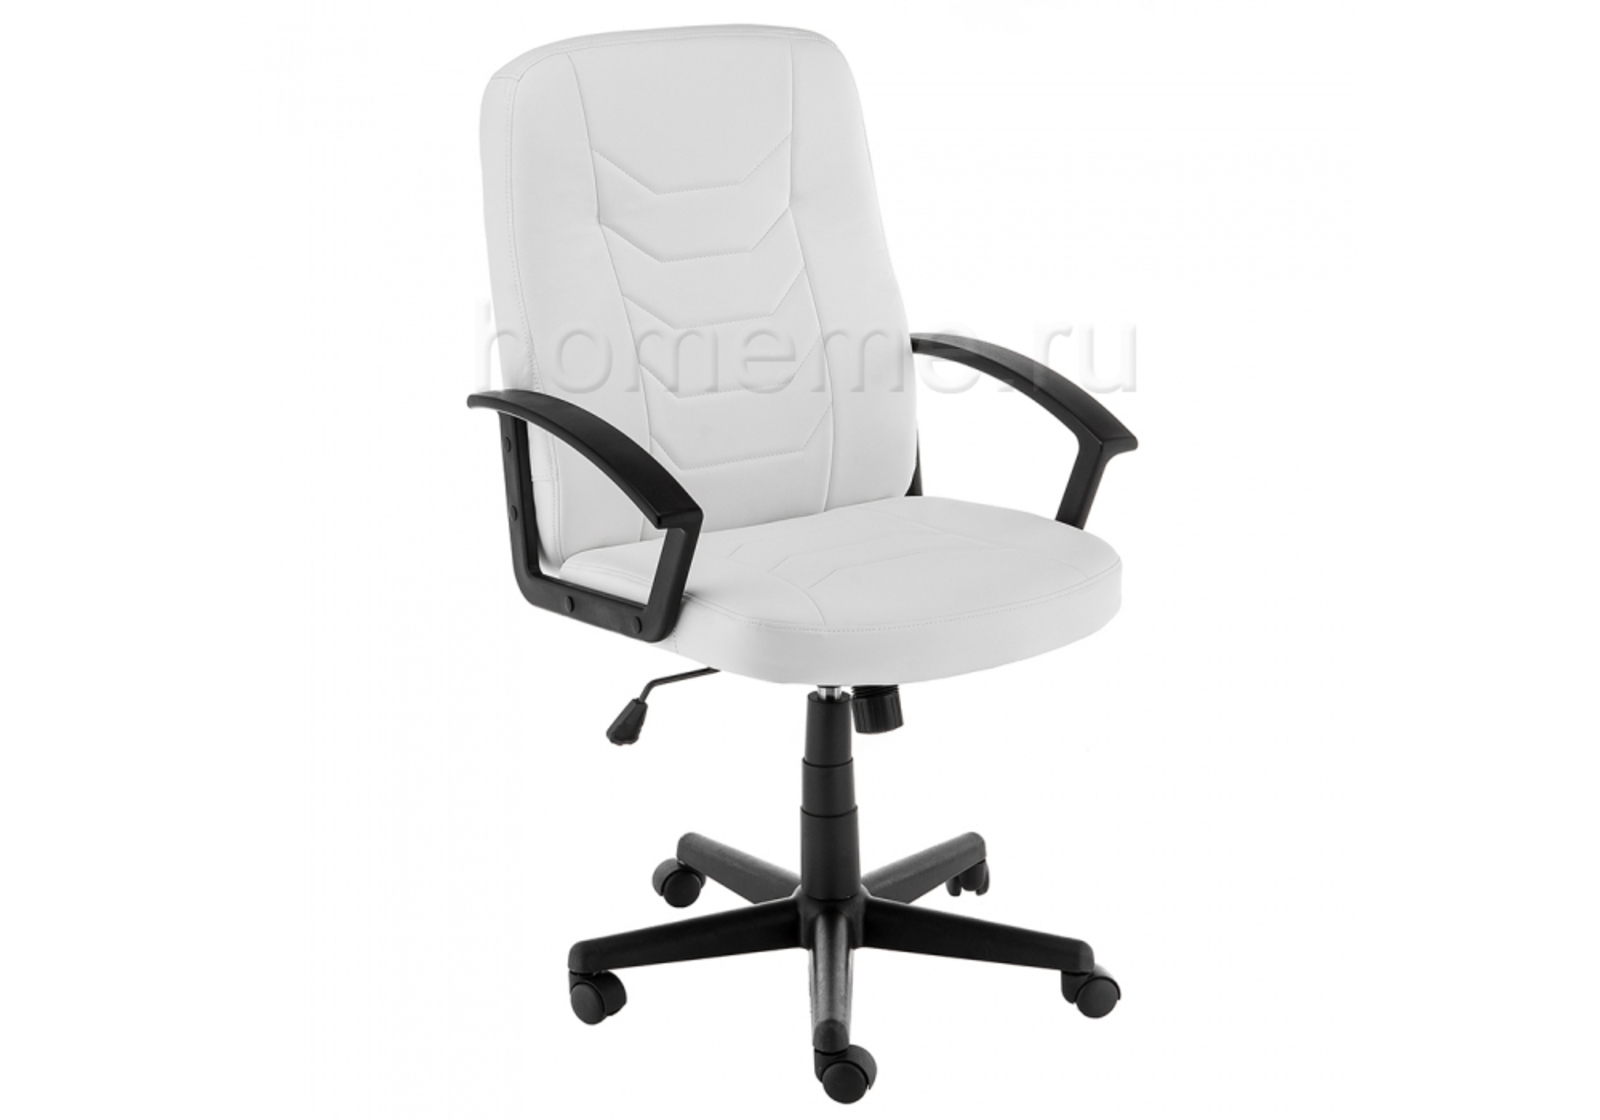 Кресло для офиса HomeMe Darin белое 11267 от Homeme.ru